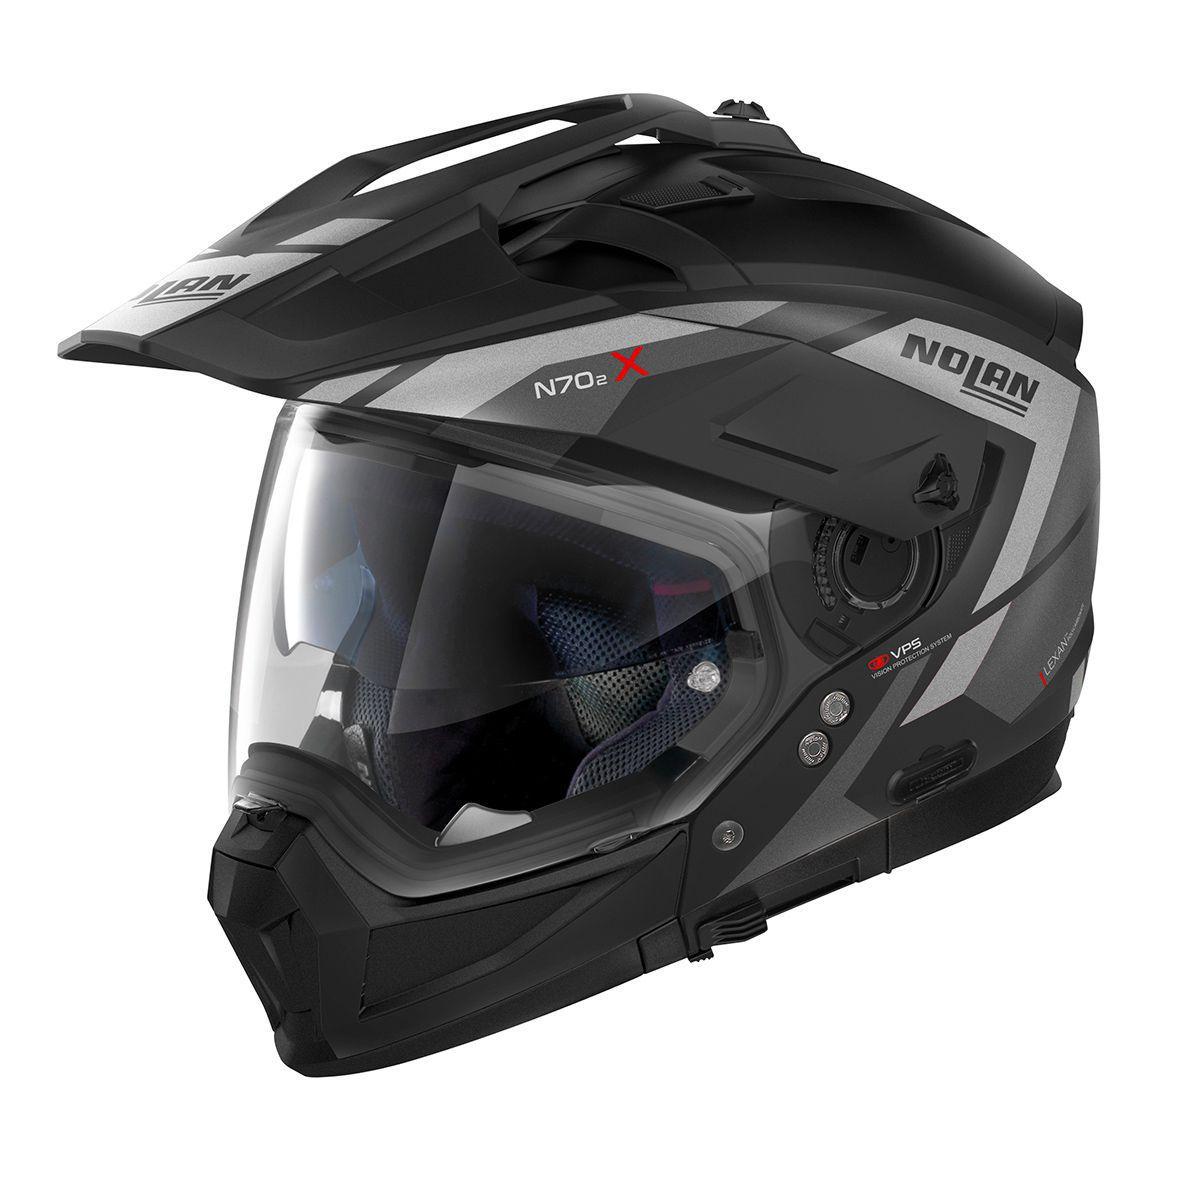 Capacete Nolan N70-2X Grandes Alpes Preto/Cinza/Fosco Big Trail / Off-Road C/ Viseira Solar - Ganhe Touca Balaclava  - Motosports